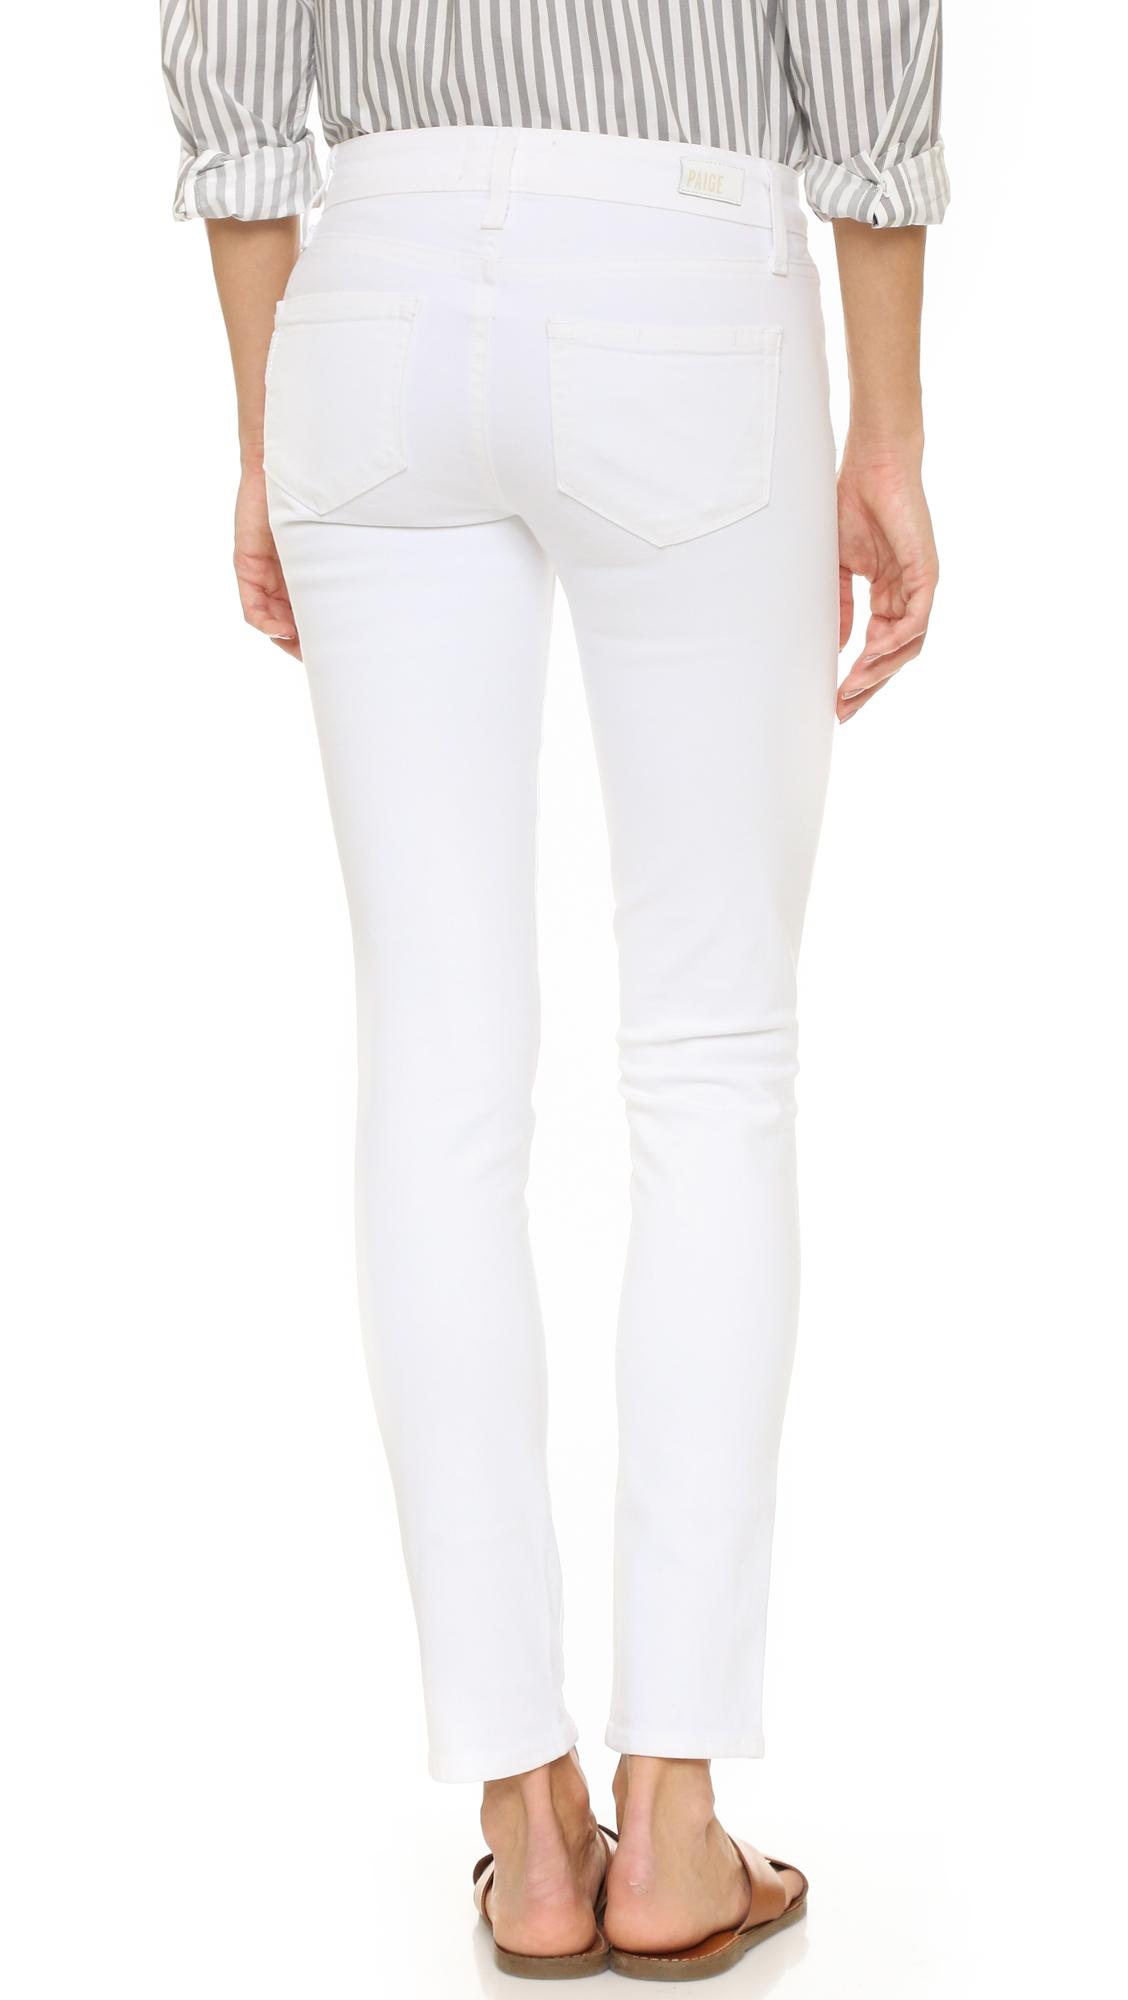 5d5aa19a6d4 PAIGE Skyline Ankle Skinny Jeans